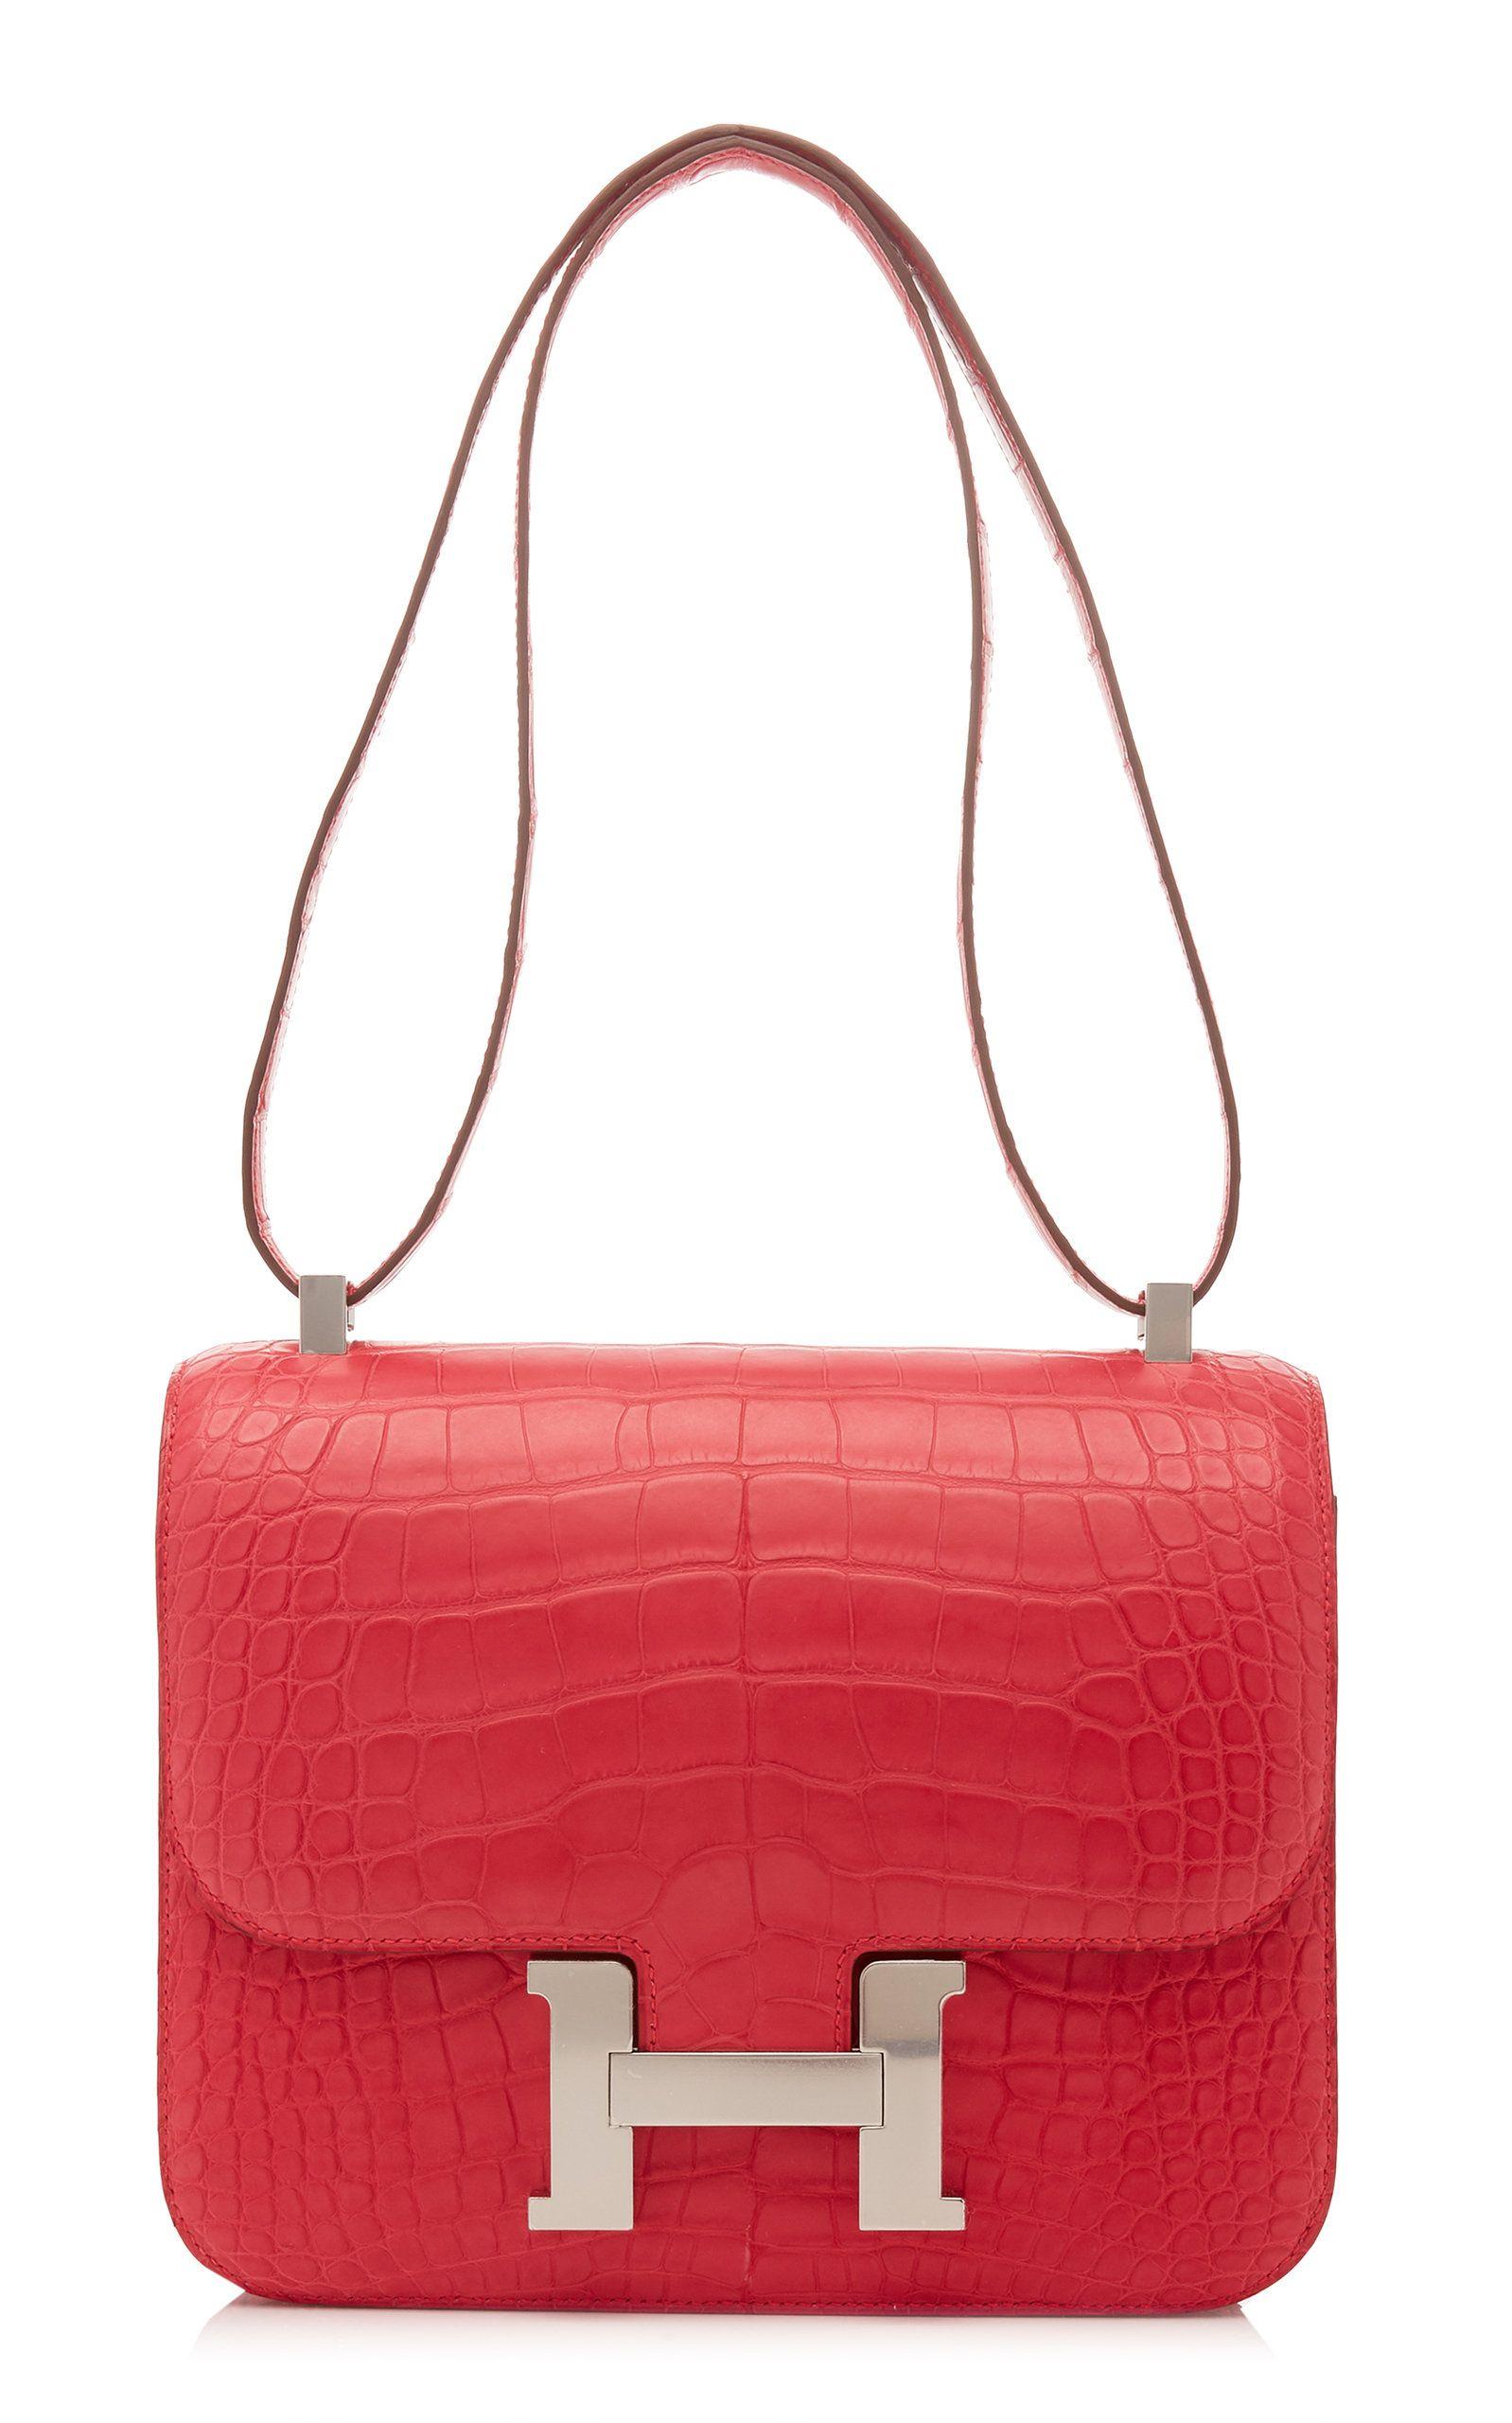 Hermès 24cm Rose Extreme Matte Alligator Constance  7a46e102a688a